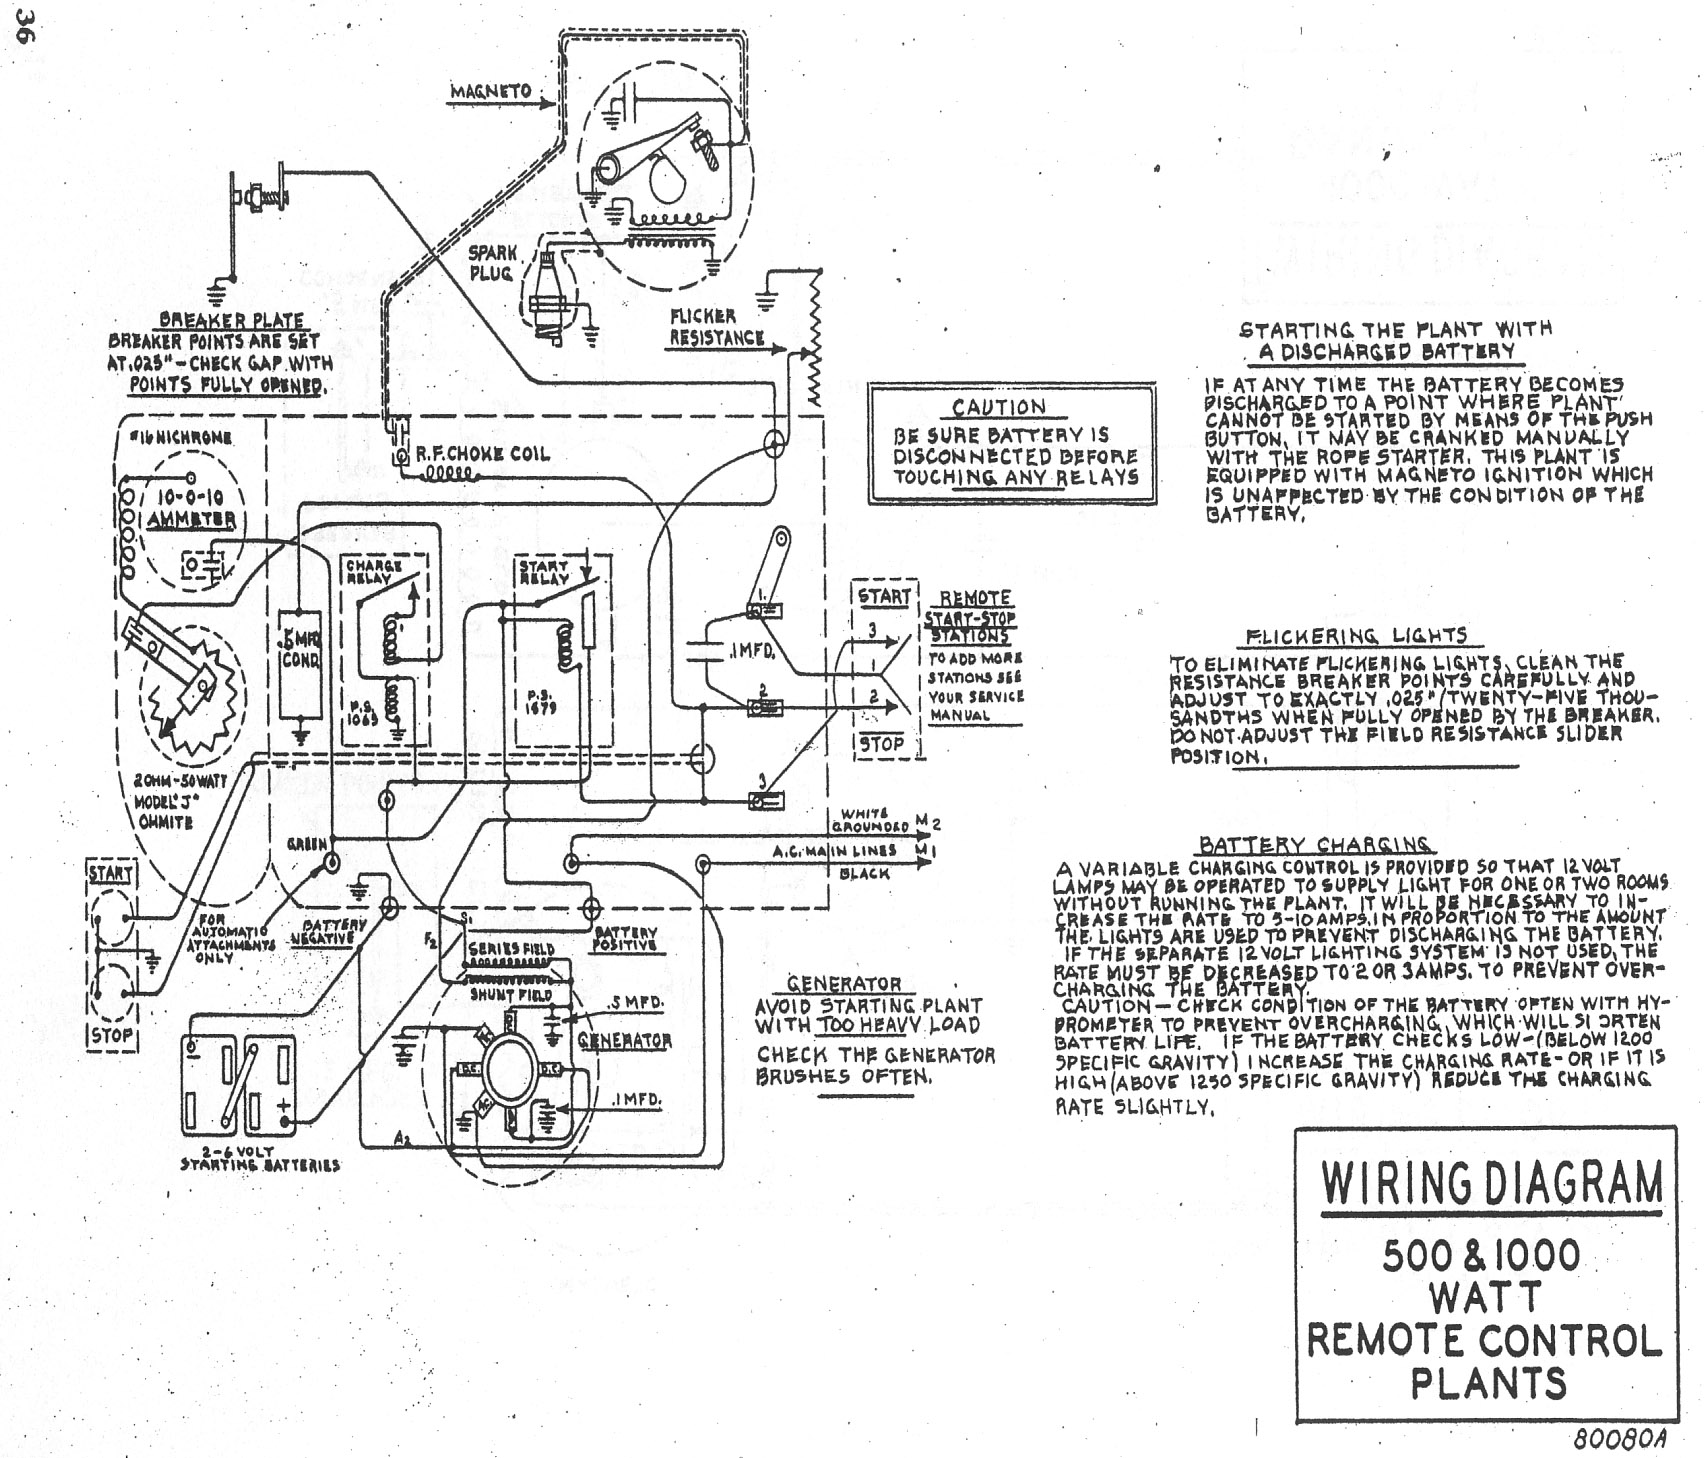 Onan 6 5 Rv Generator Control Wiring Diagram Fairbanks Morse 1 Kw Light Plant Manual